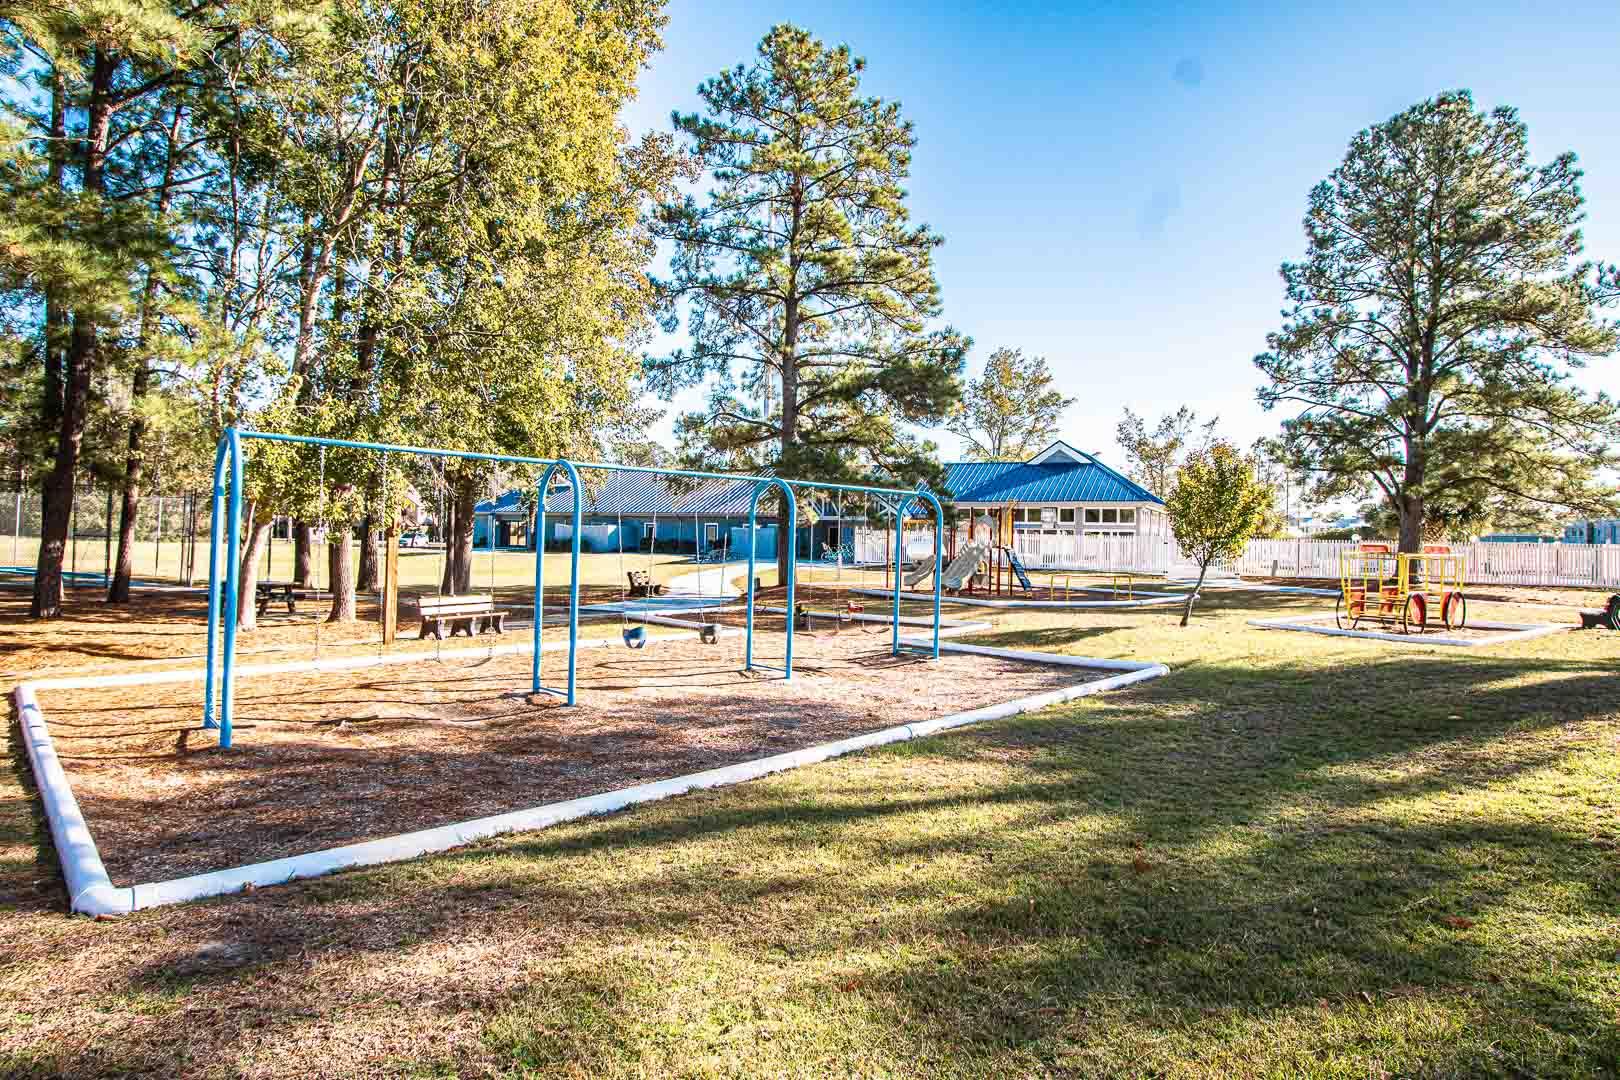 An outdoor children's playground at VRI's Sandcastle Cove in New Bern, North Carolina.